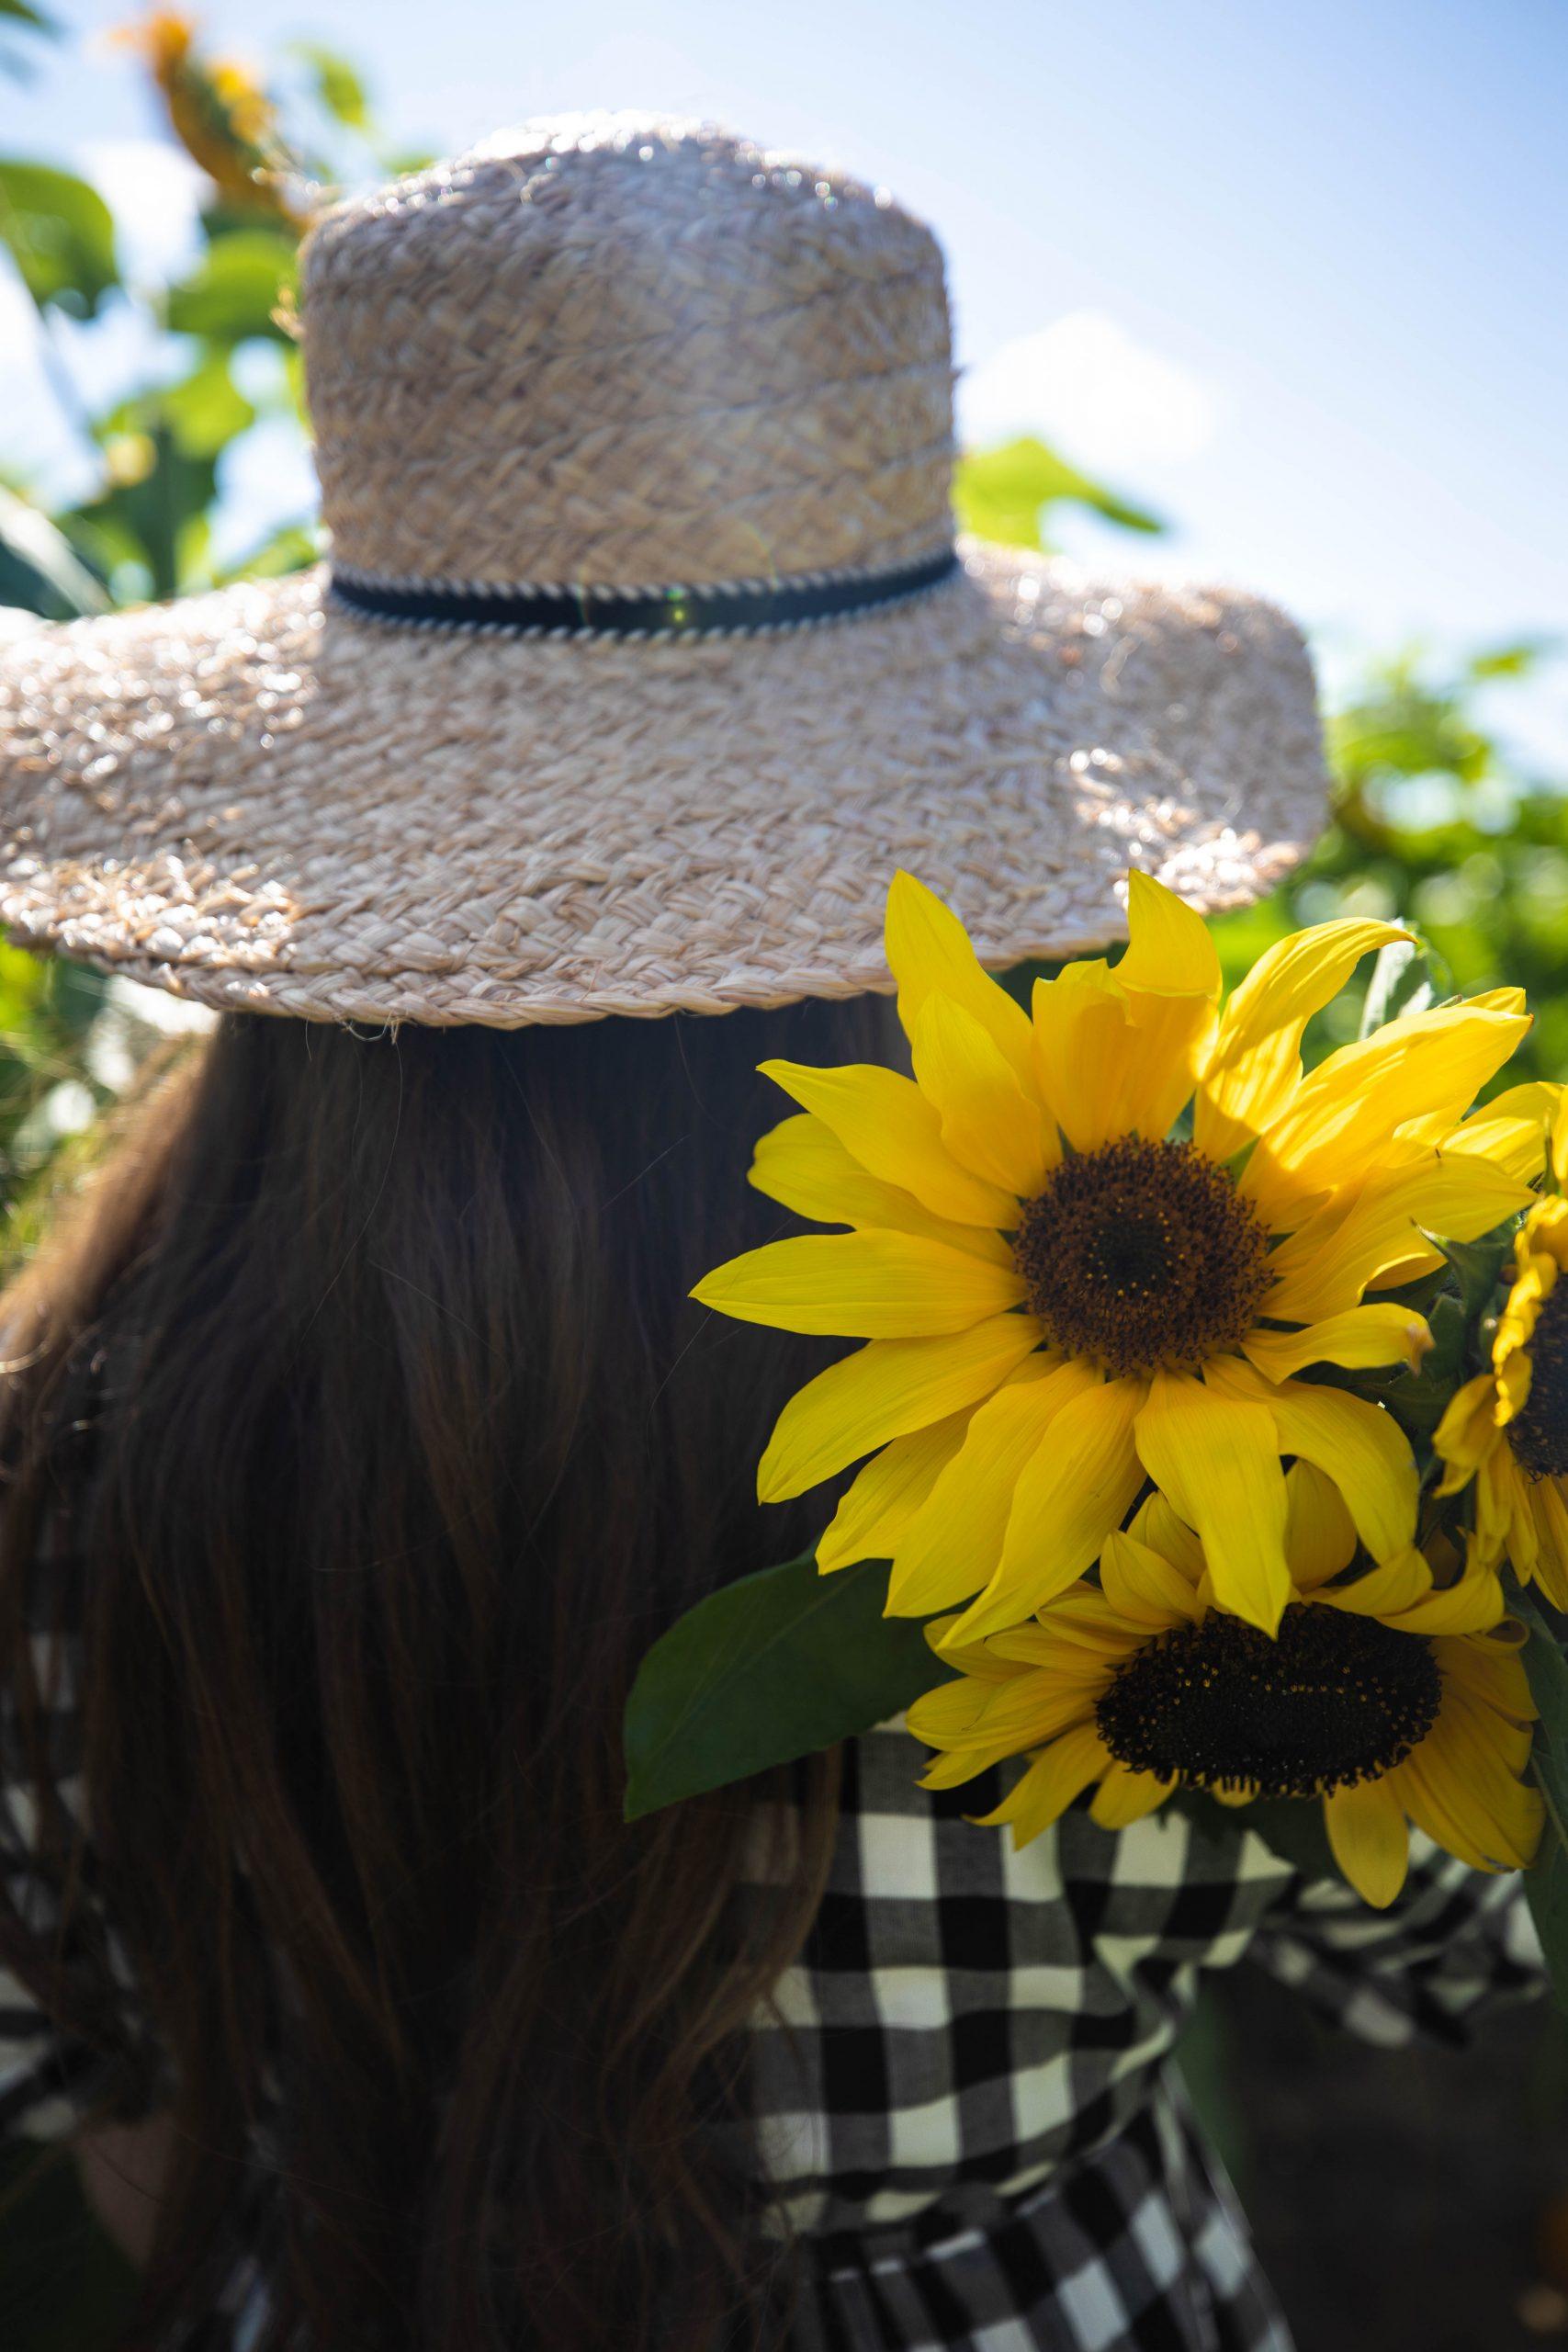 Picking Sunflowers in the Sunshine at DeBucks Corn Maze and Flower Farm Belleville Michigan by Annie Fairfax